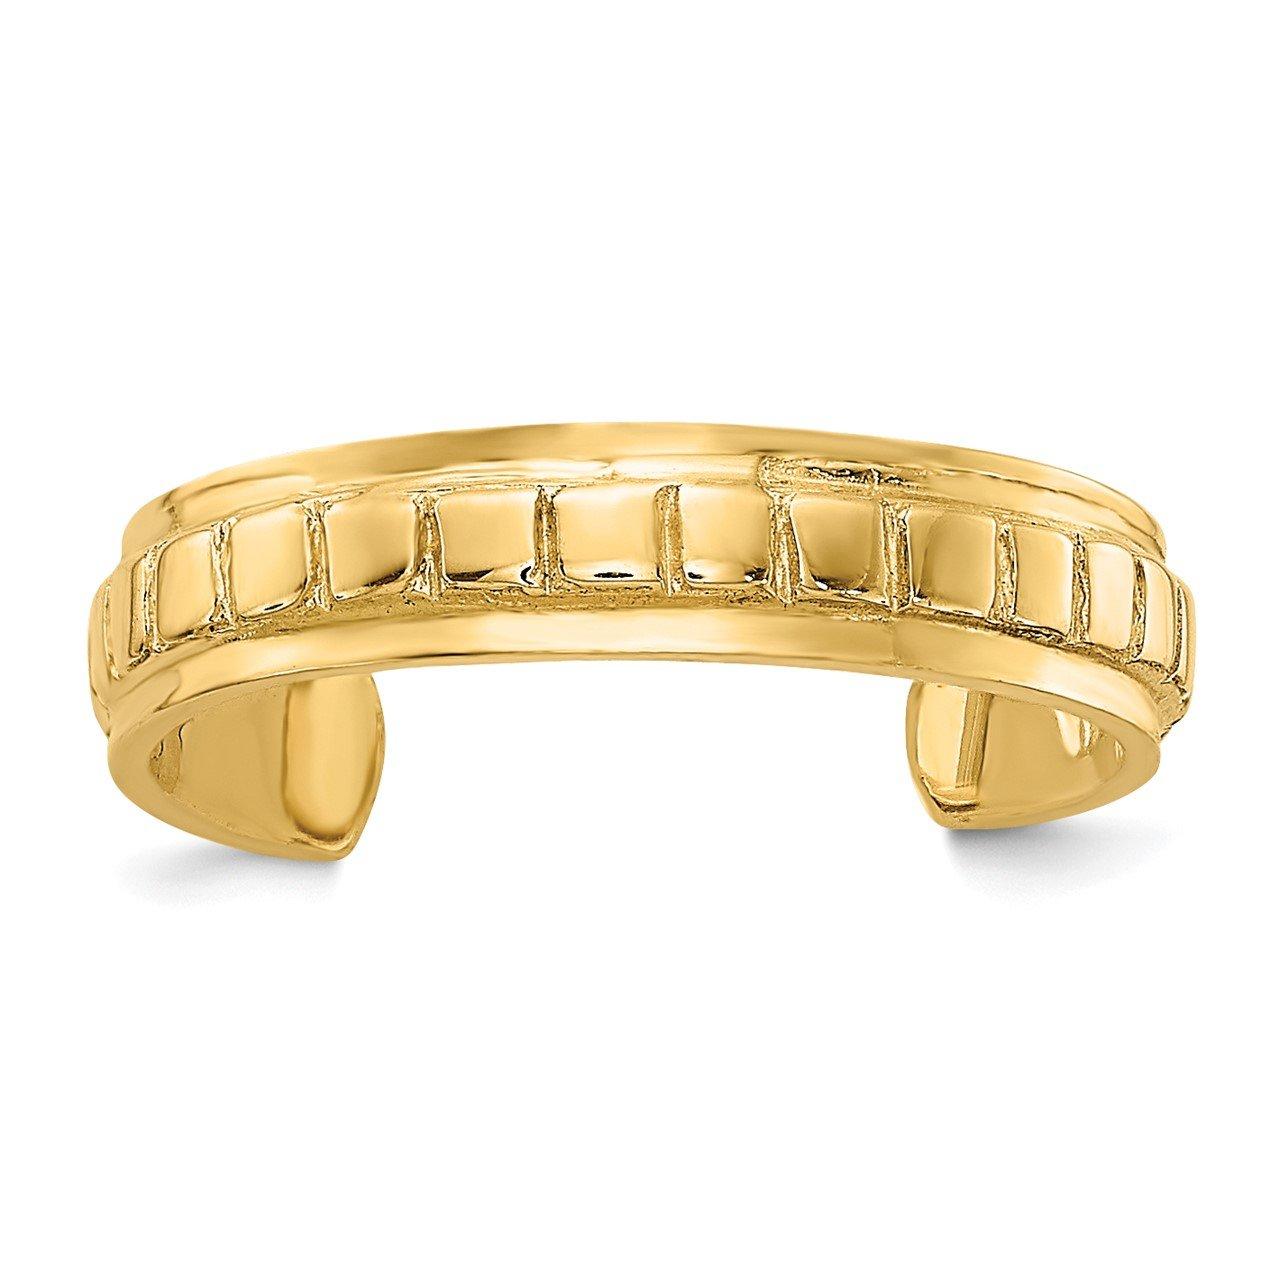 14k Polished and Diamond-cut Toe Ring